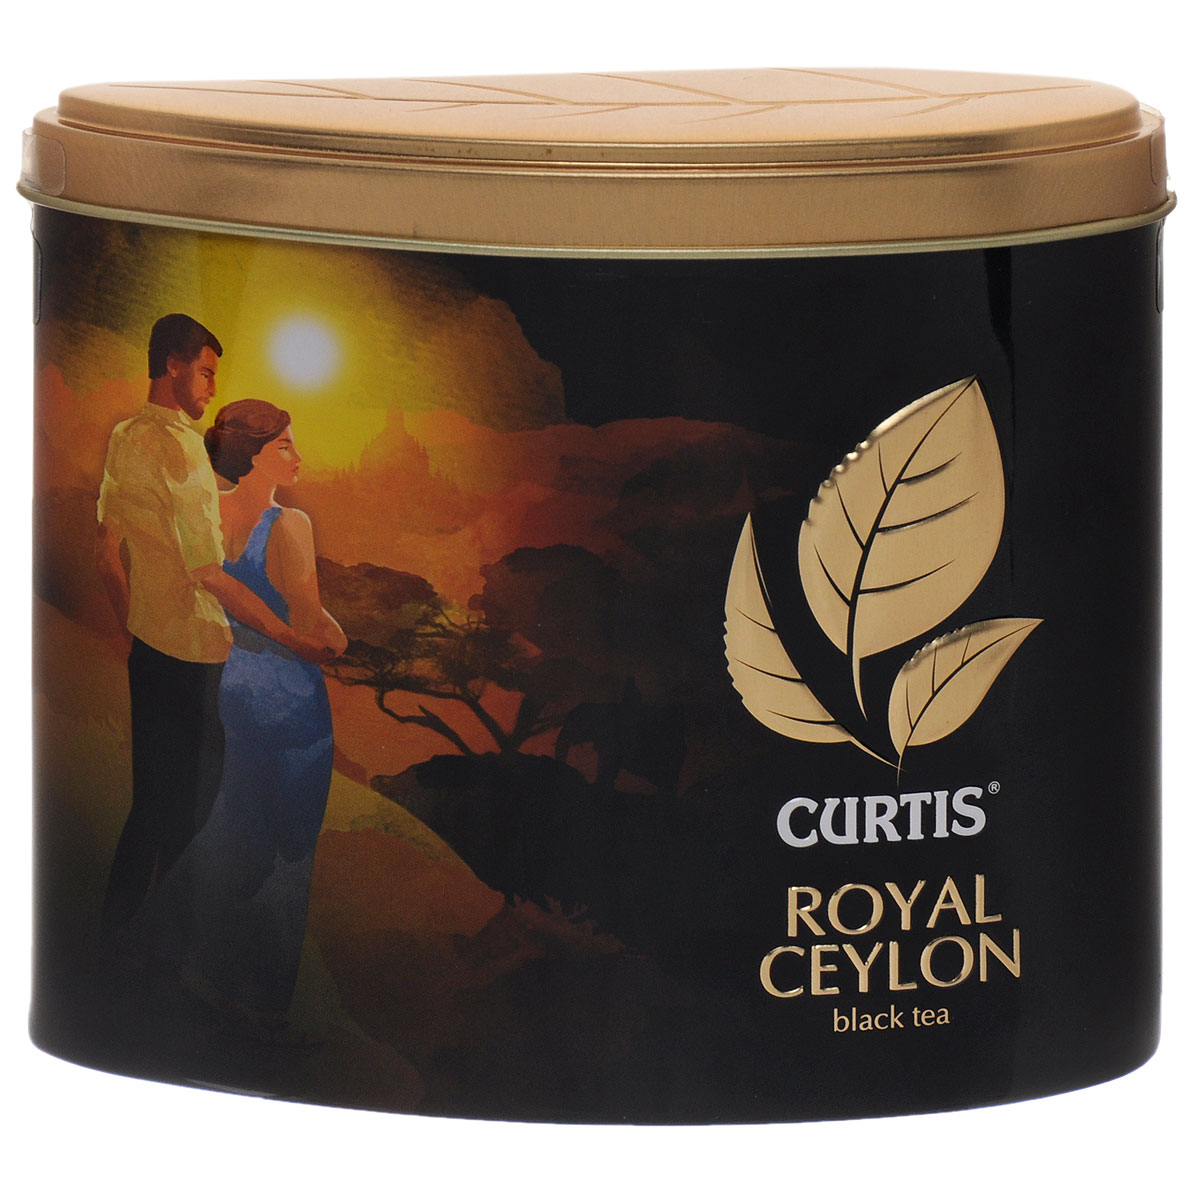 Curtis Royal Ceylon черный листовой чай, 80 г515401Curtis Royal Ceylon - крупнолистовой цейлонский черный чай. Высший сорт.